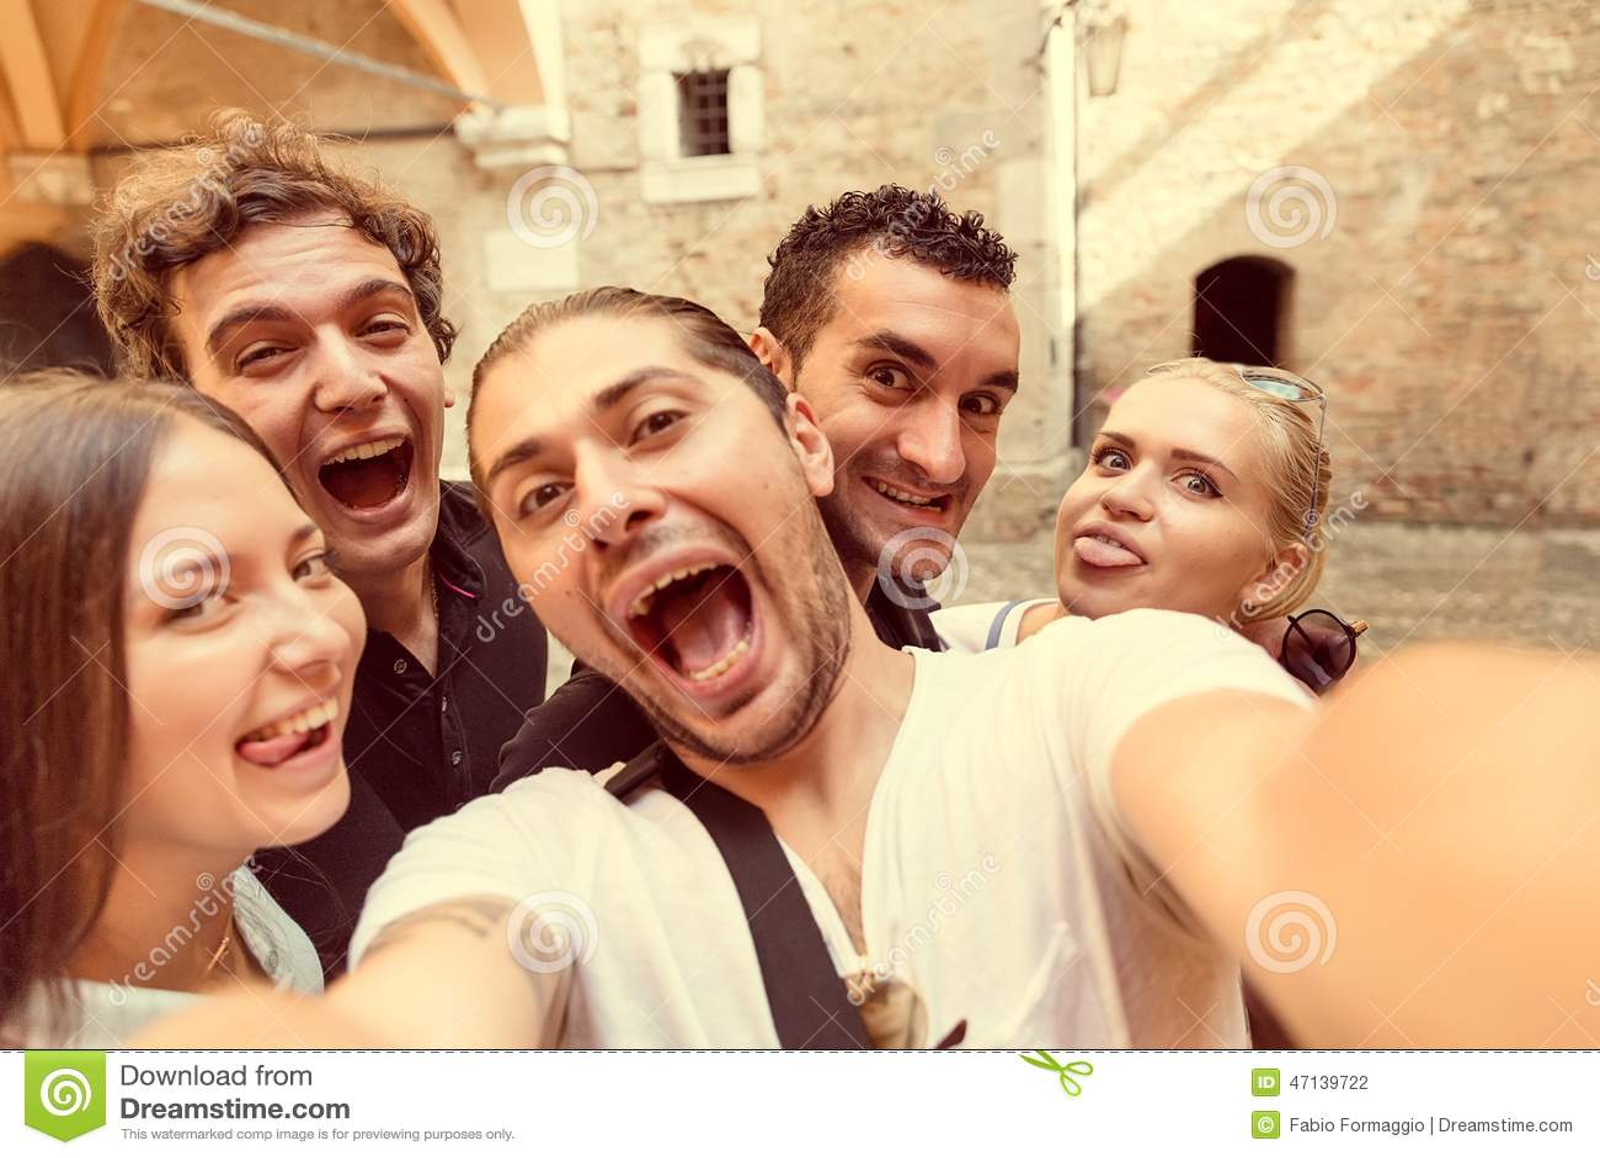 Selfie with friends in Milan